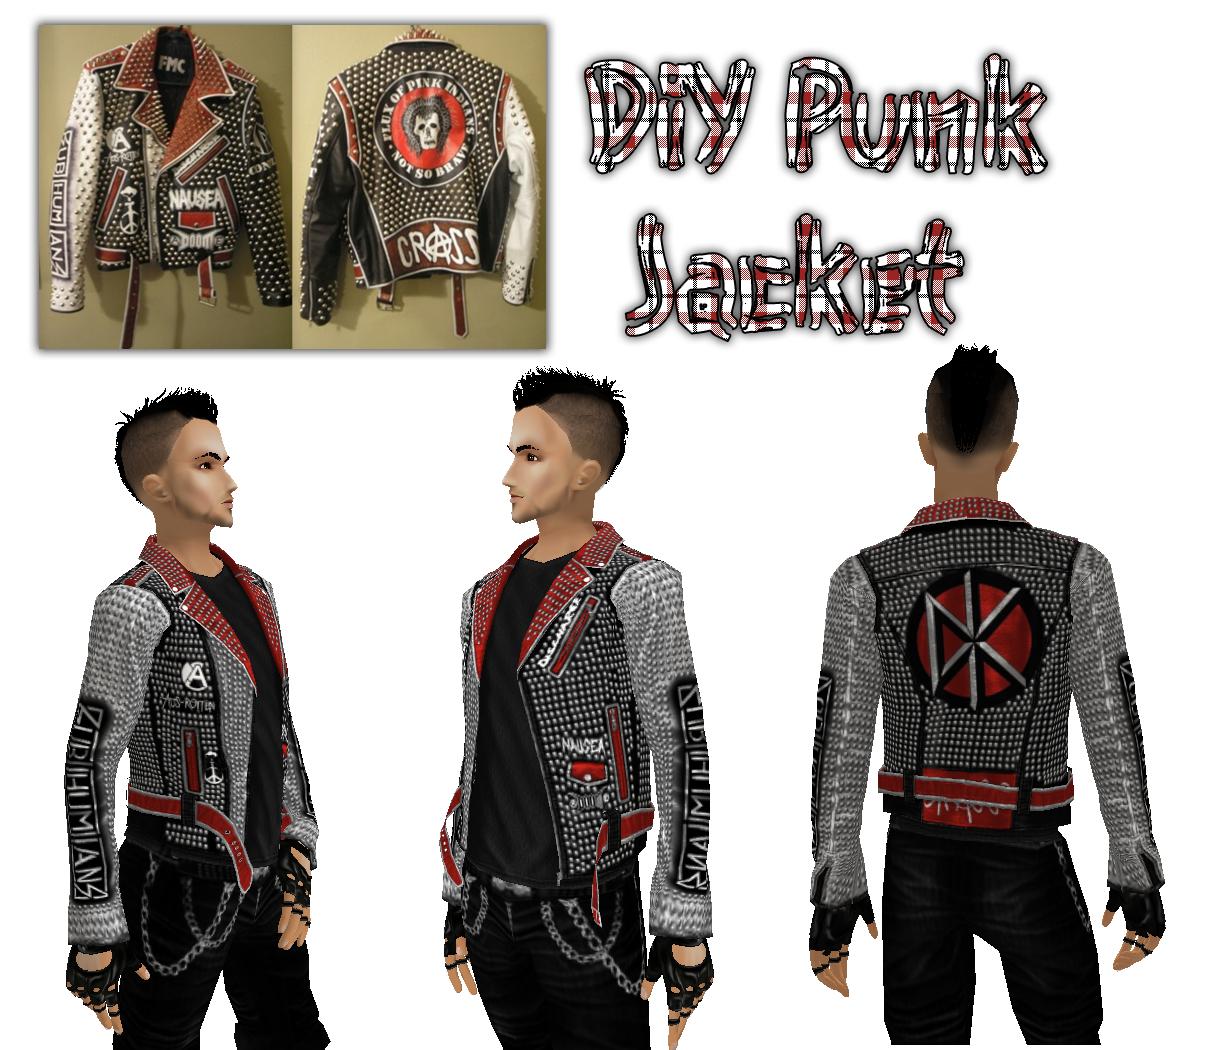 White DiY Punk Jacket by crowhitewolf on DeviantArt